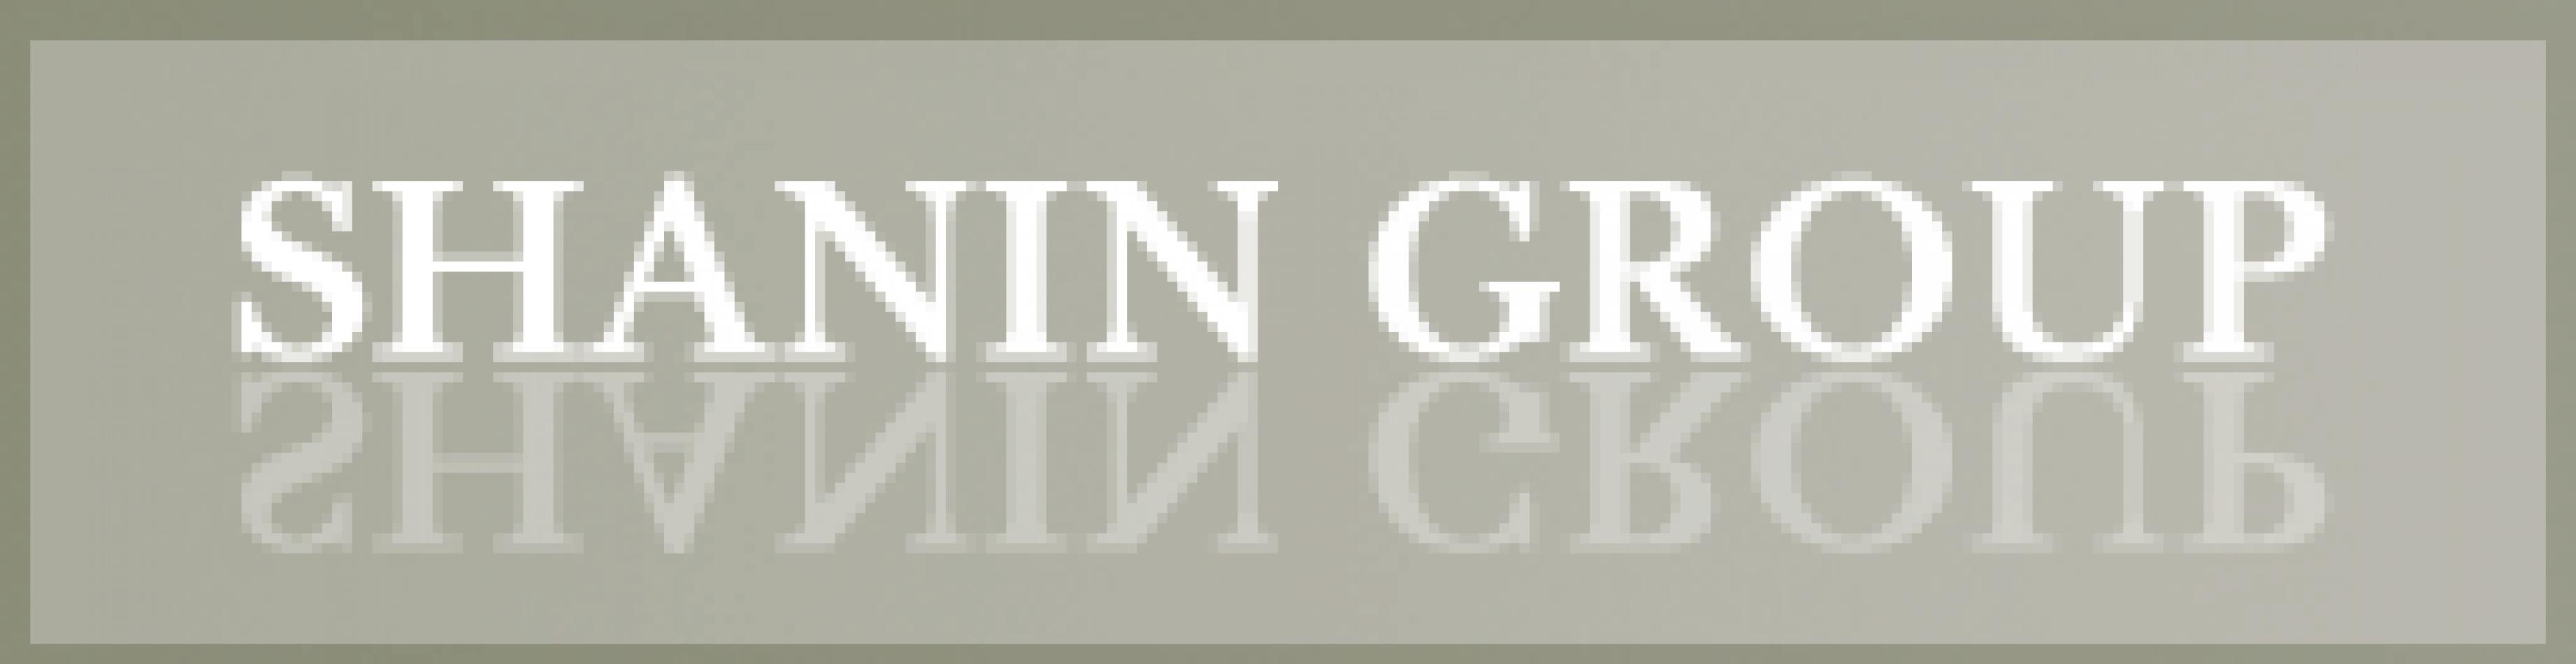 THE SHANIN CORPORATION (SHANIN GROUP)